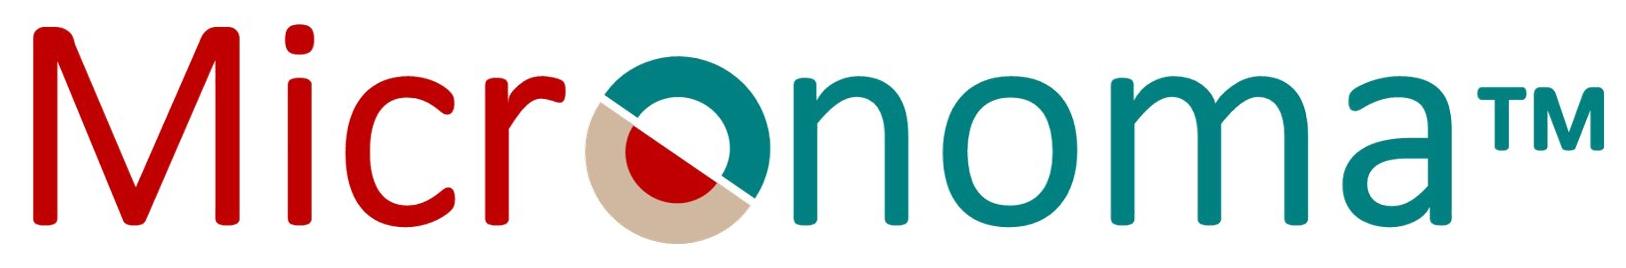 Micronoma-logo-1